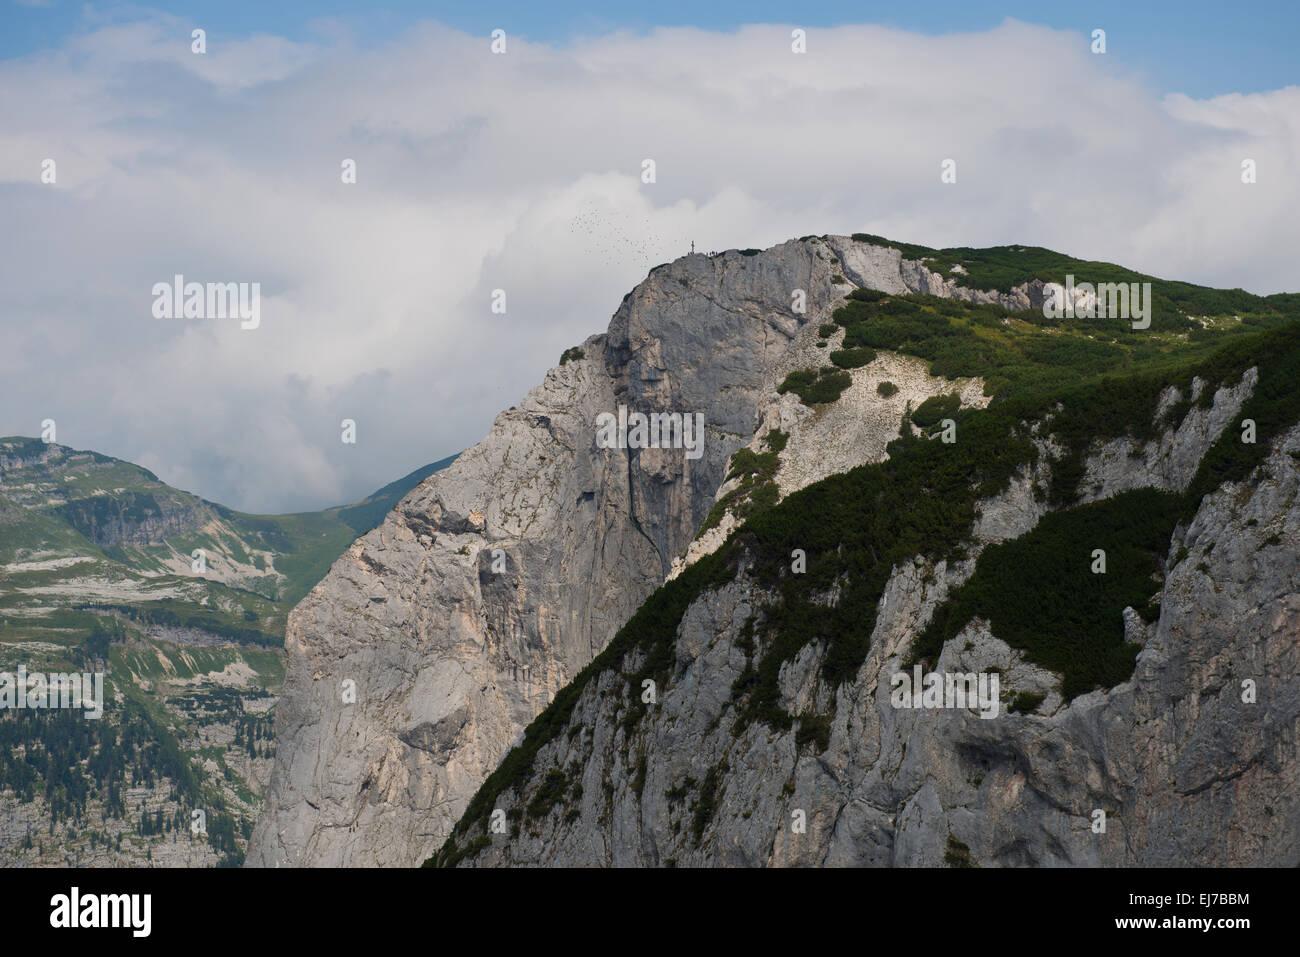 Trisselwand, Altaussee, Salzkammergut, Styria, Austria - Stock Image